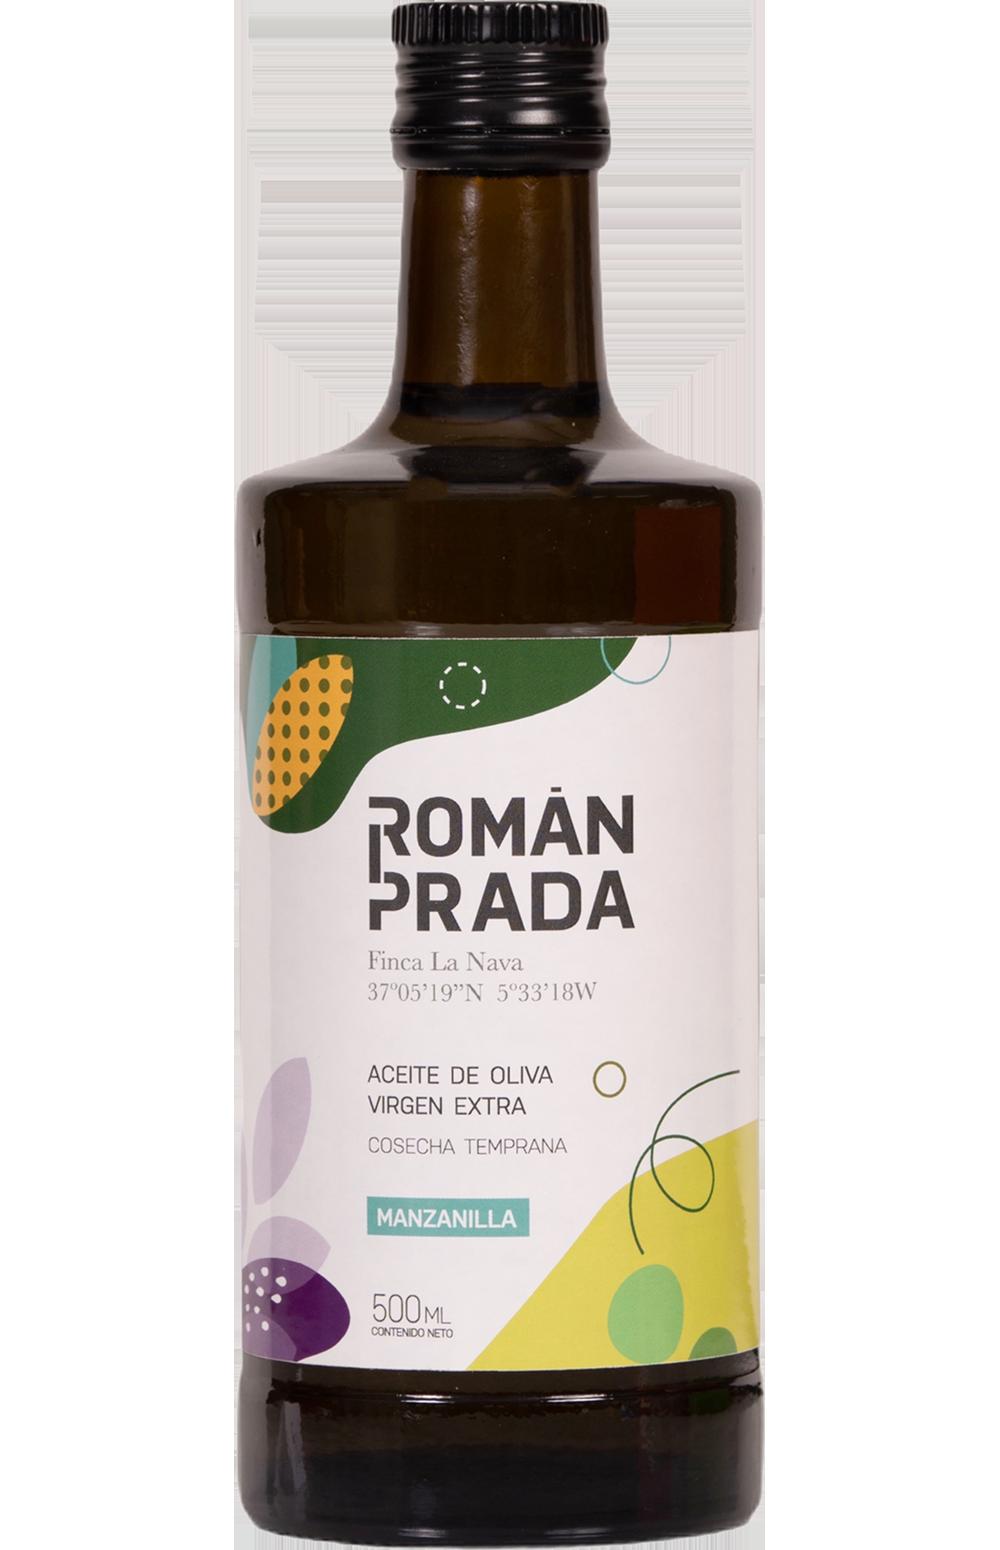 Roman Prada Manzanilla